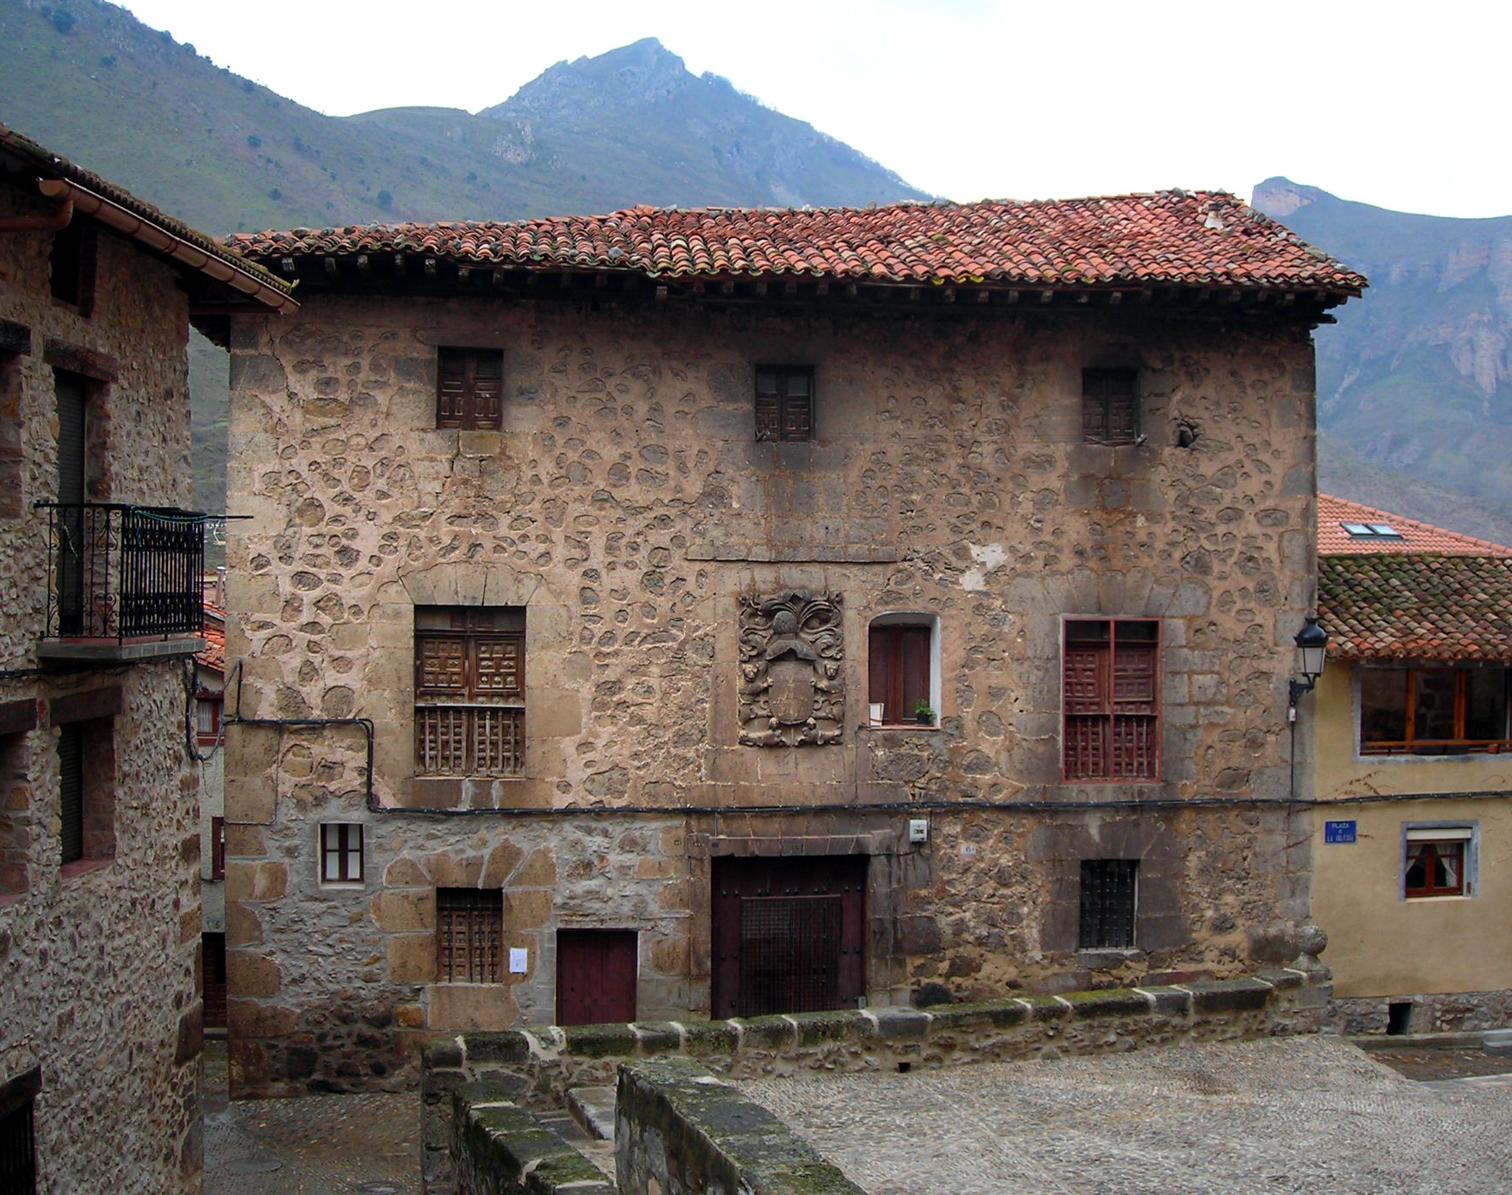 Casas solariegas en la rioja 395 anguiano i pza de la - Casas prefabricadas la rioja ...